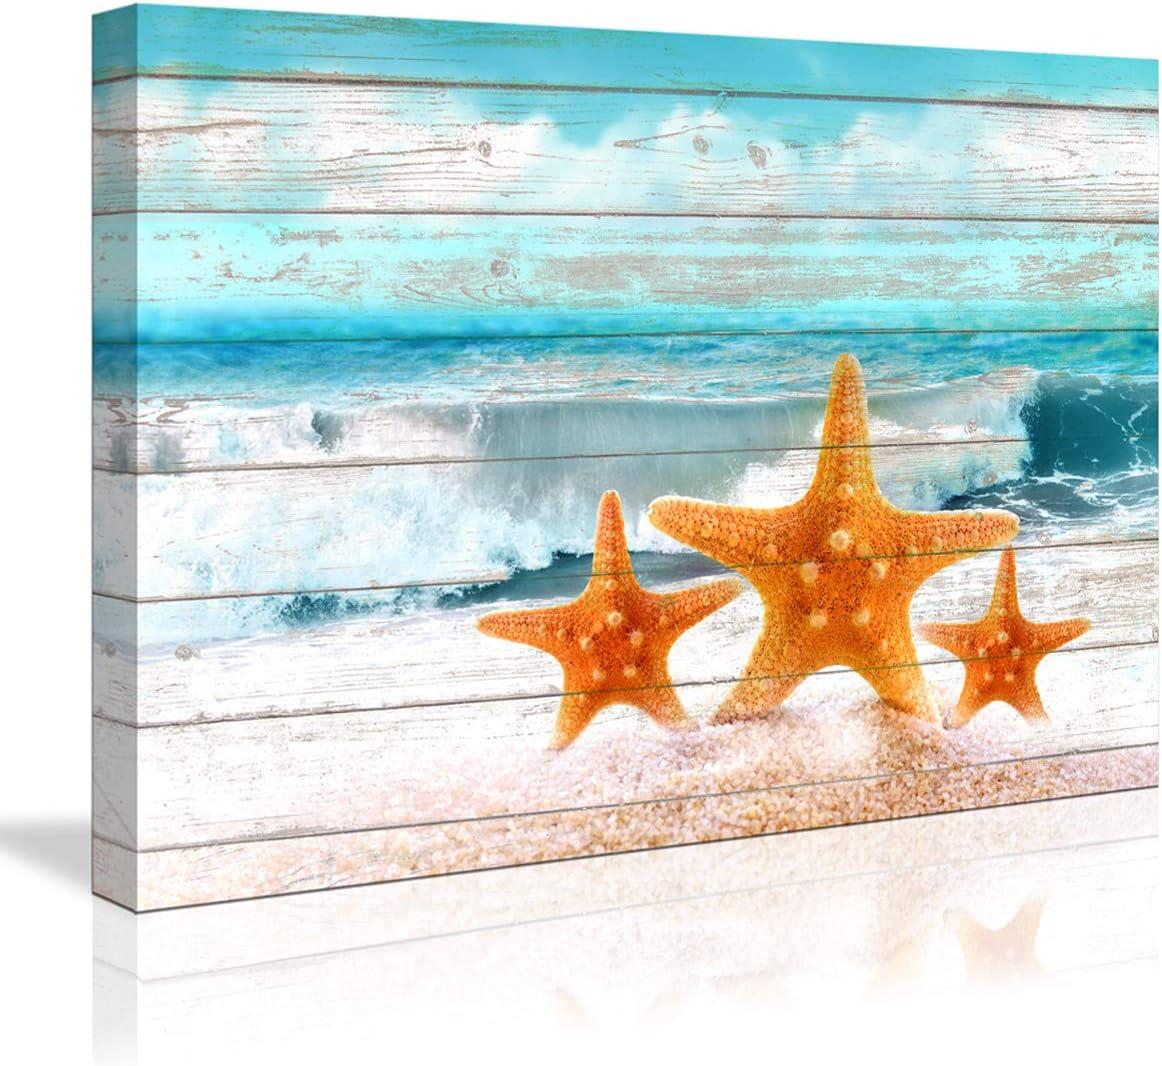 Amazon Com Ocean Home Decor Bathroom Wall Decor Board Beach Sea Starfish Wall Art Bathroom Decor Prints Canvas Wall Art Small Framed Artwork For Walls Modern Paintings On Canvas Prints Starfish 16x24inch Posters